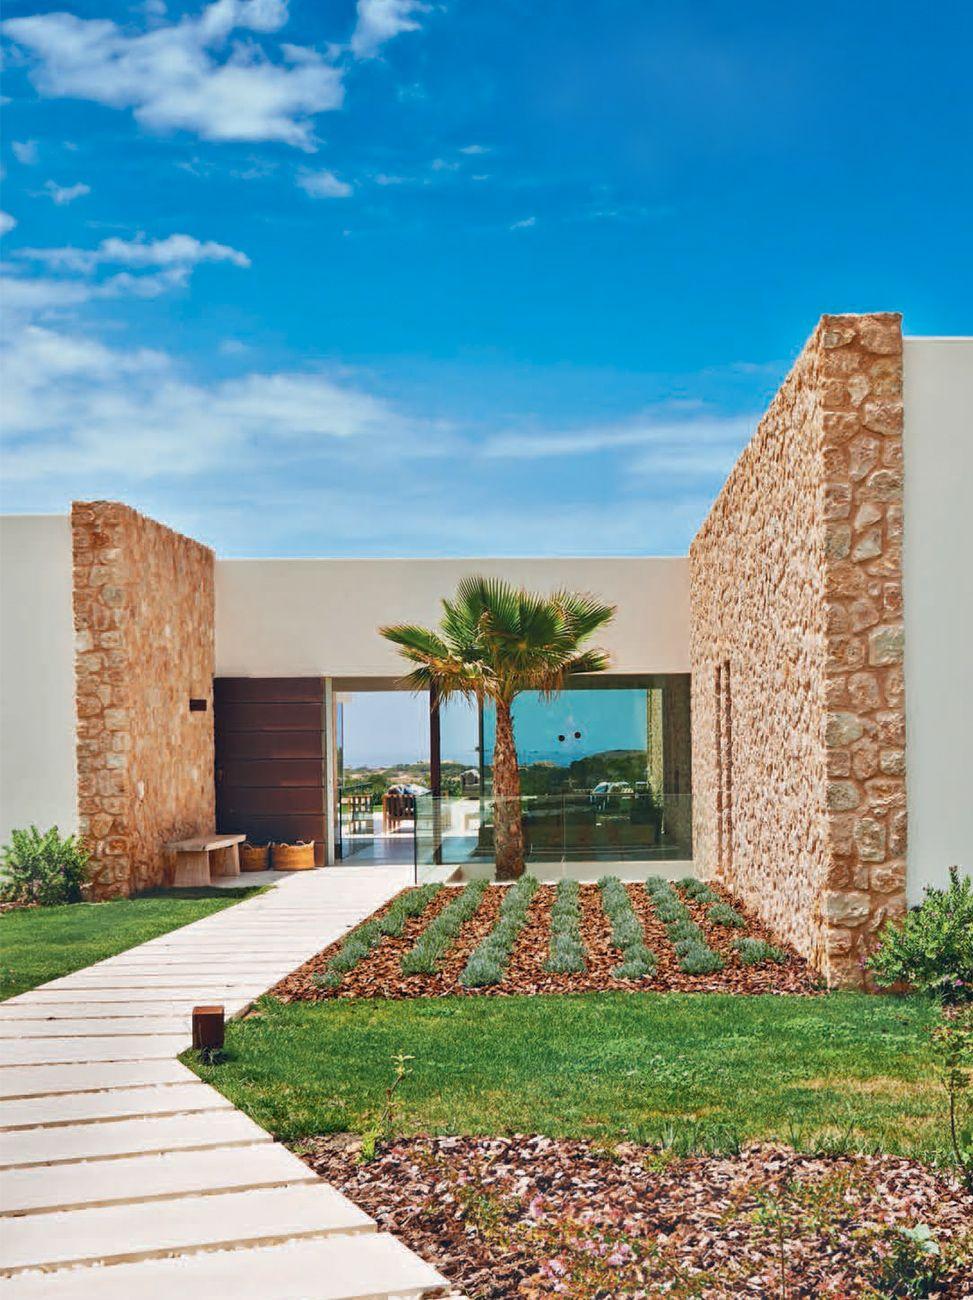 Cala Comte, Ibiza – Studio MILO | Paredes piedra | Pinterest | Piedra